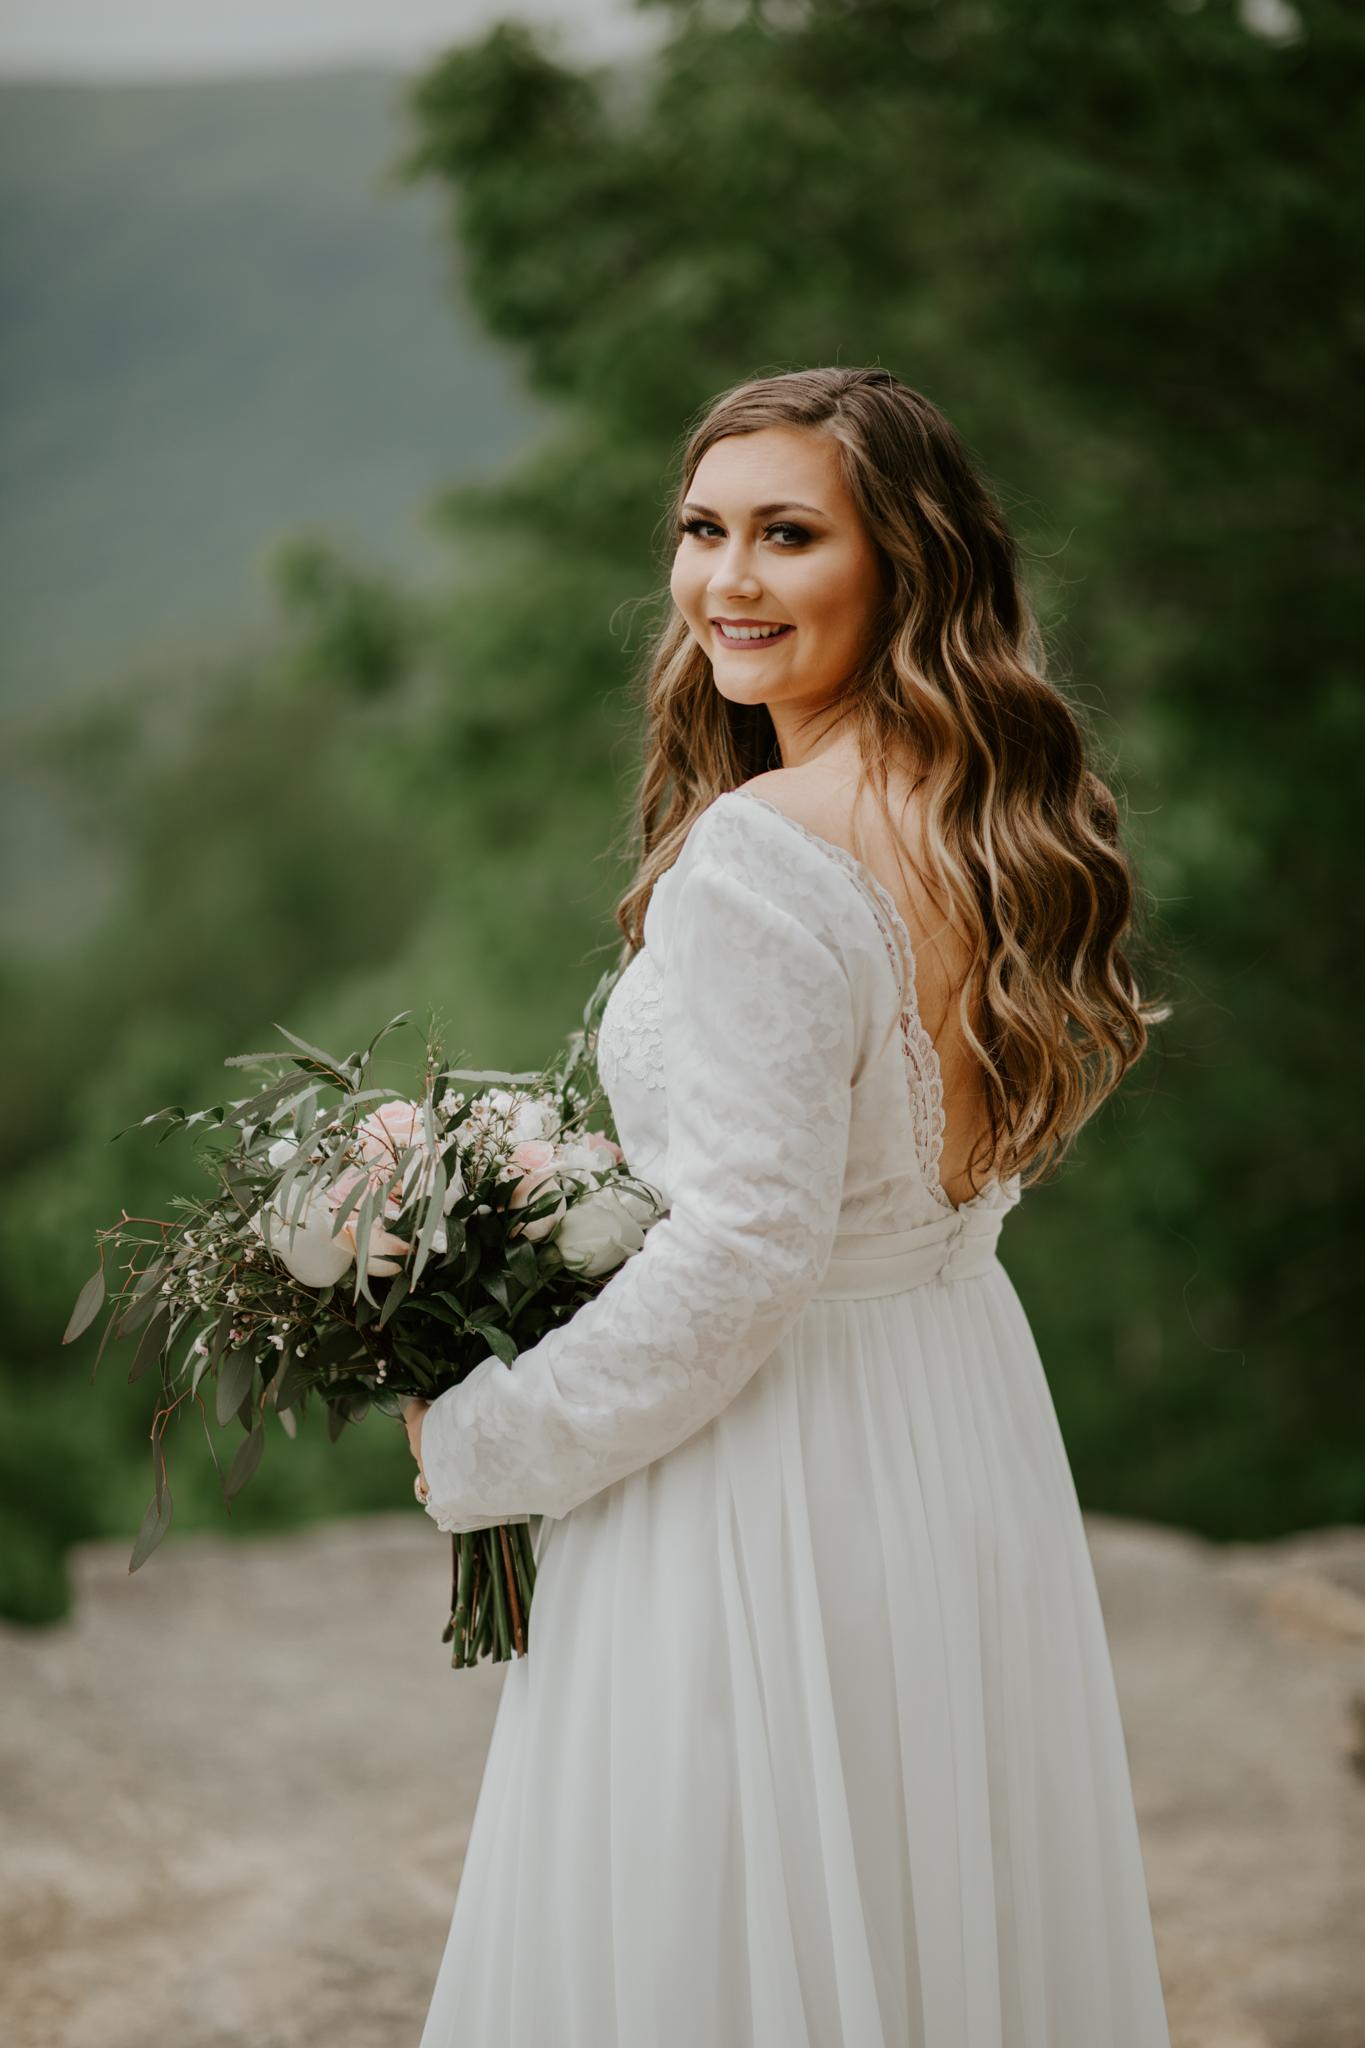 Lacey-Joe-Chattanooga-Nashville-Tennessee-Wedding-Elopement-Photographer-25.jpg